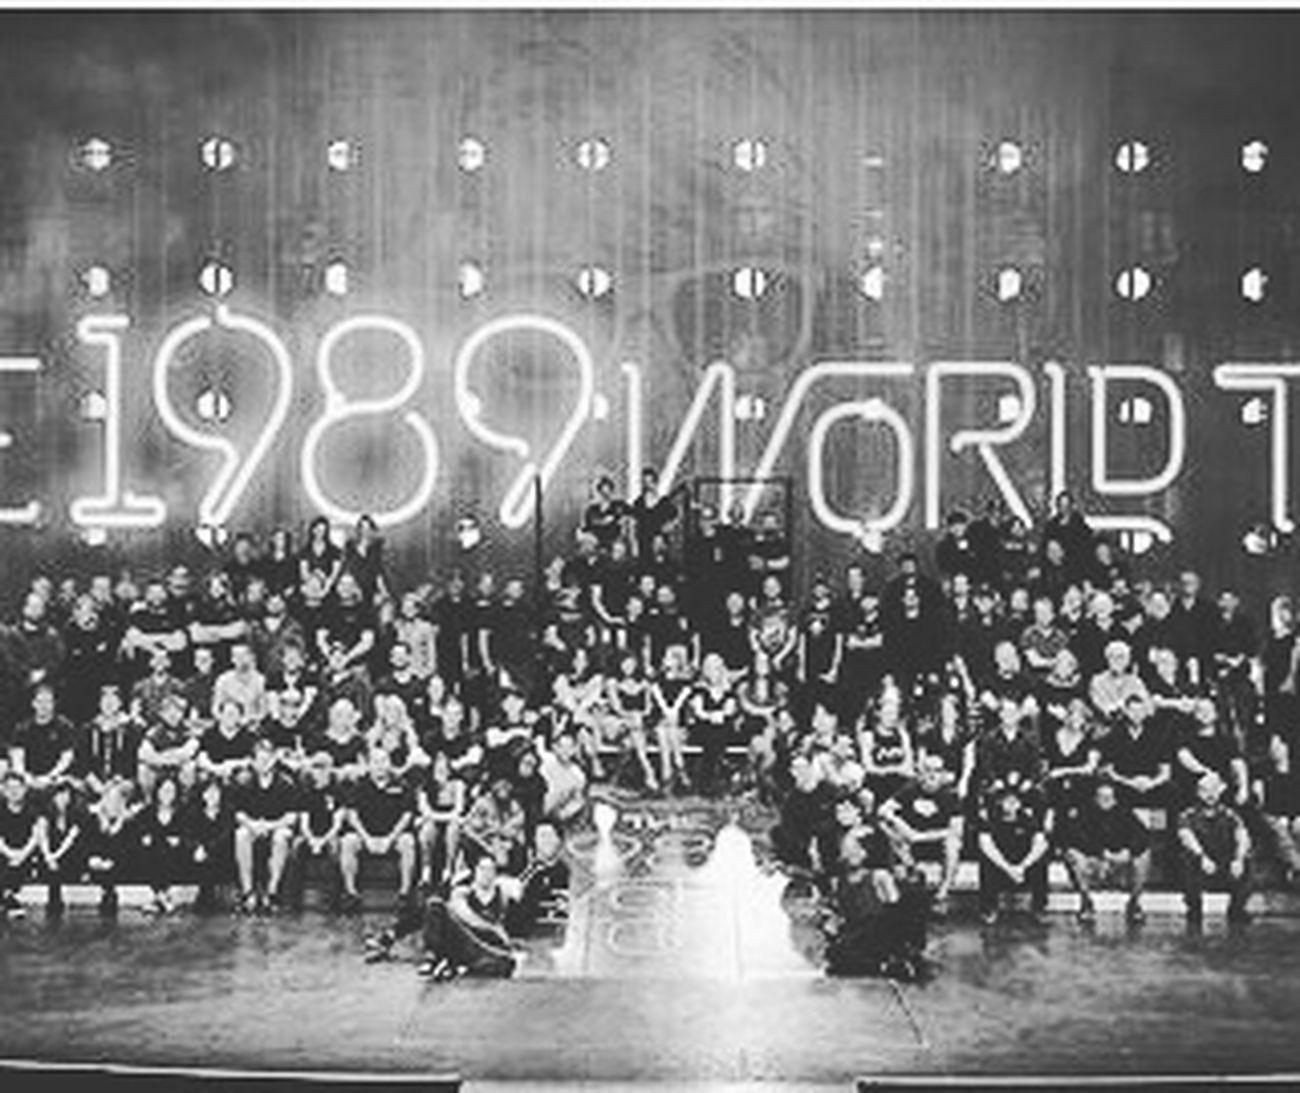 @taylorswift 1989worldtour